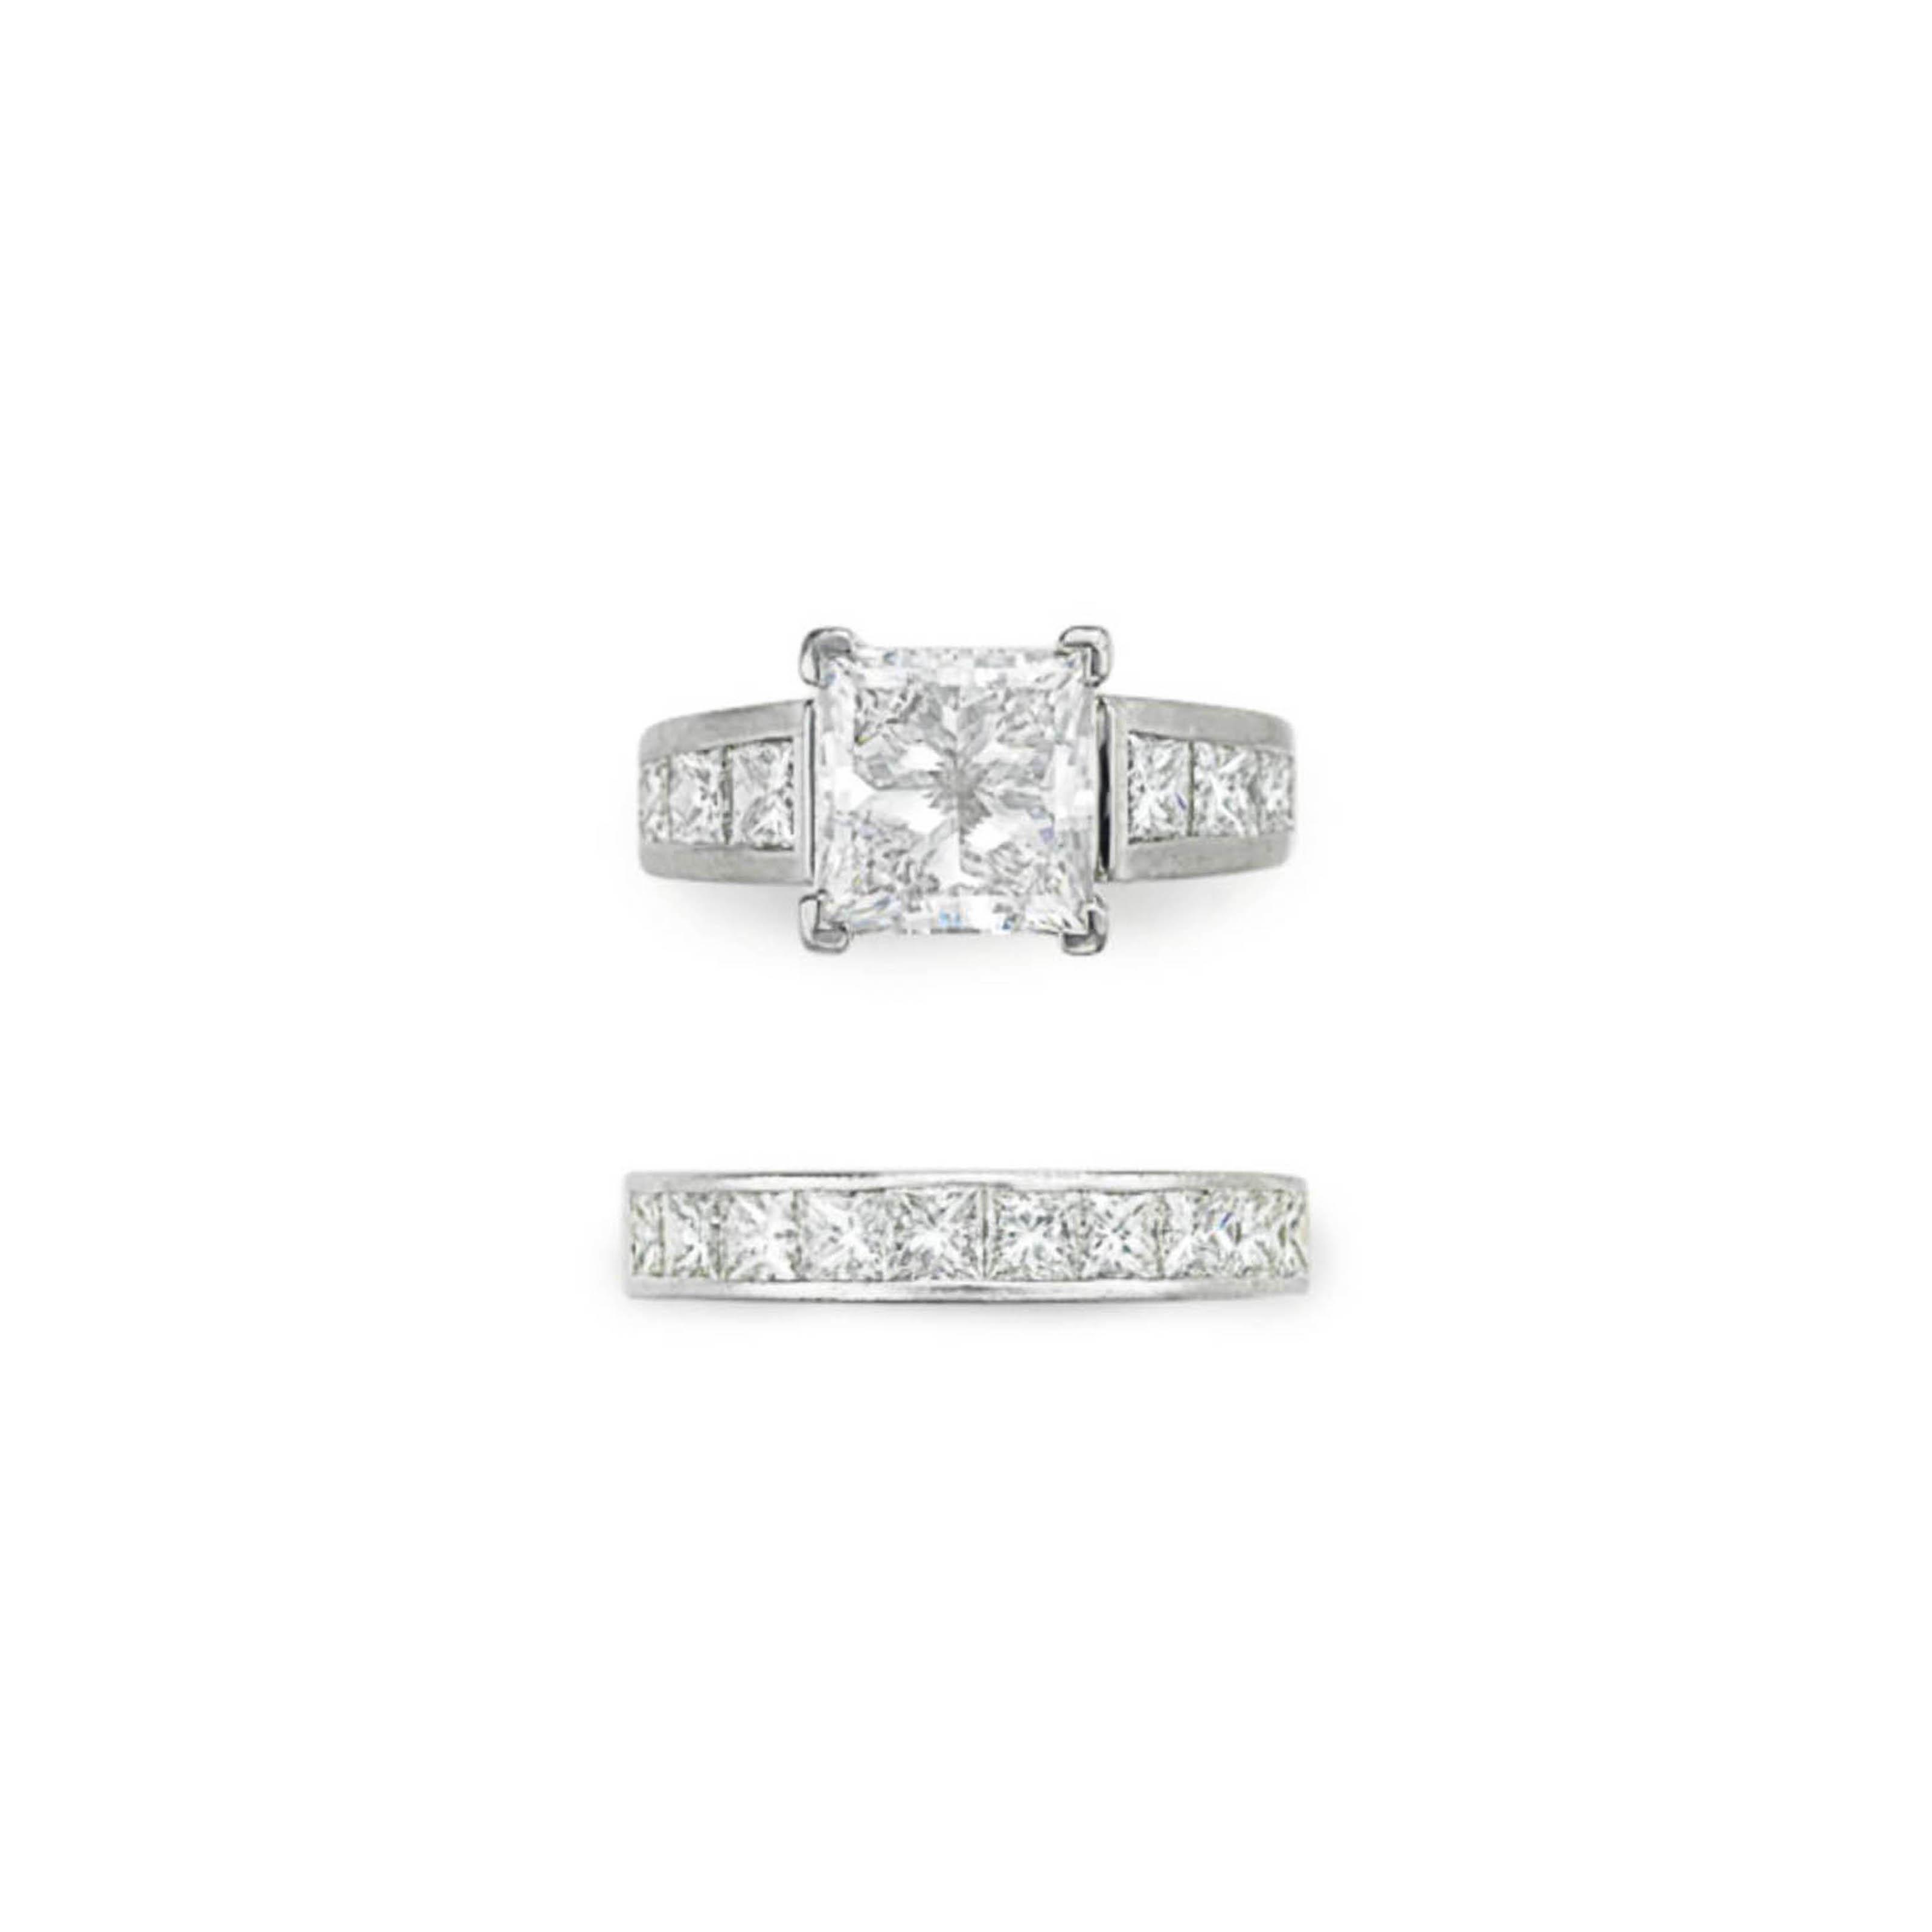 A DIAMOND RING AND WEDDING BAN